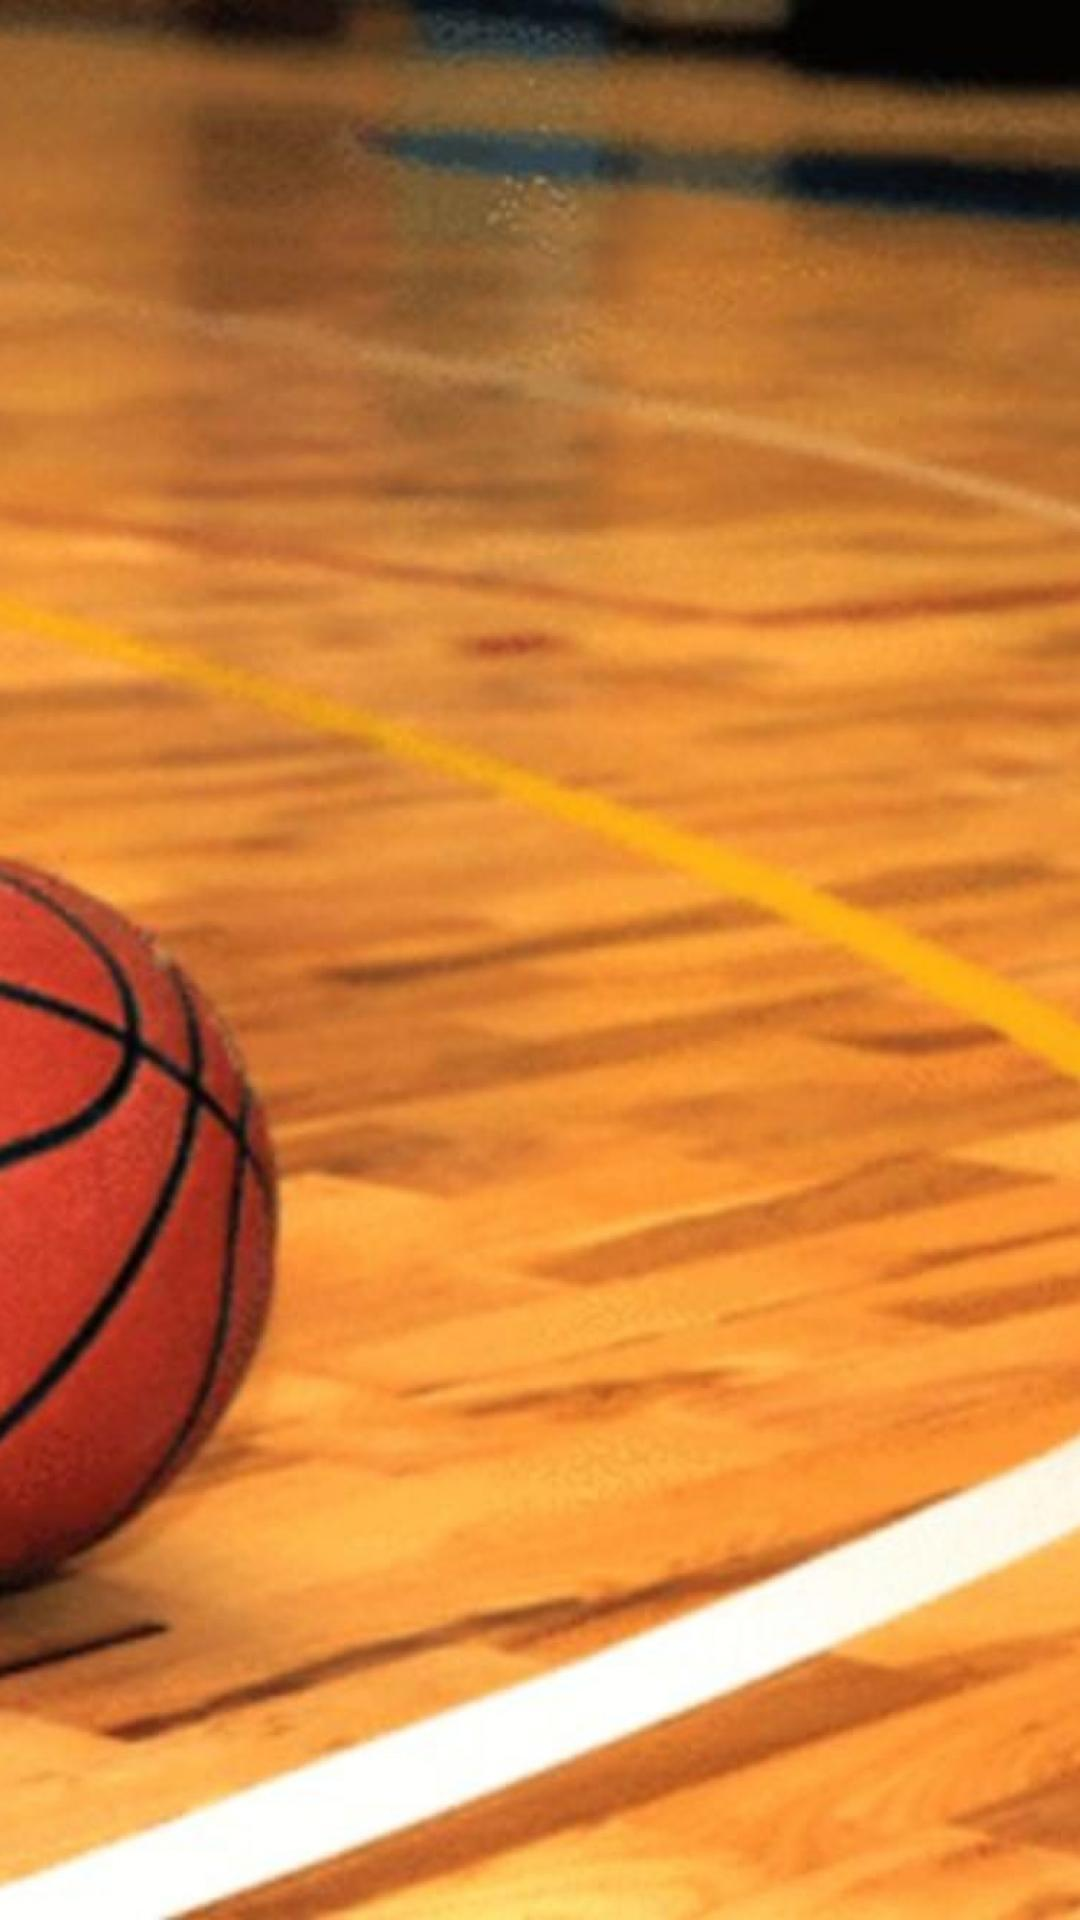 Free Download Basketball Court Wallpaper 86724 1080x1920